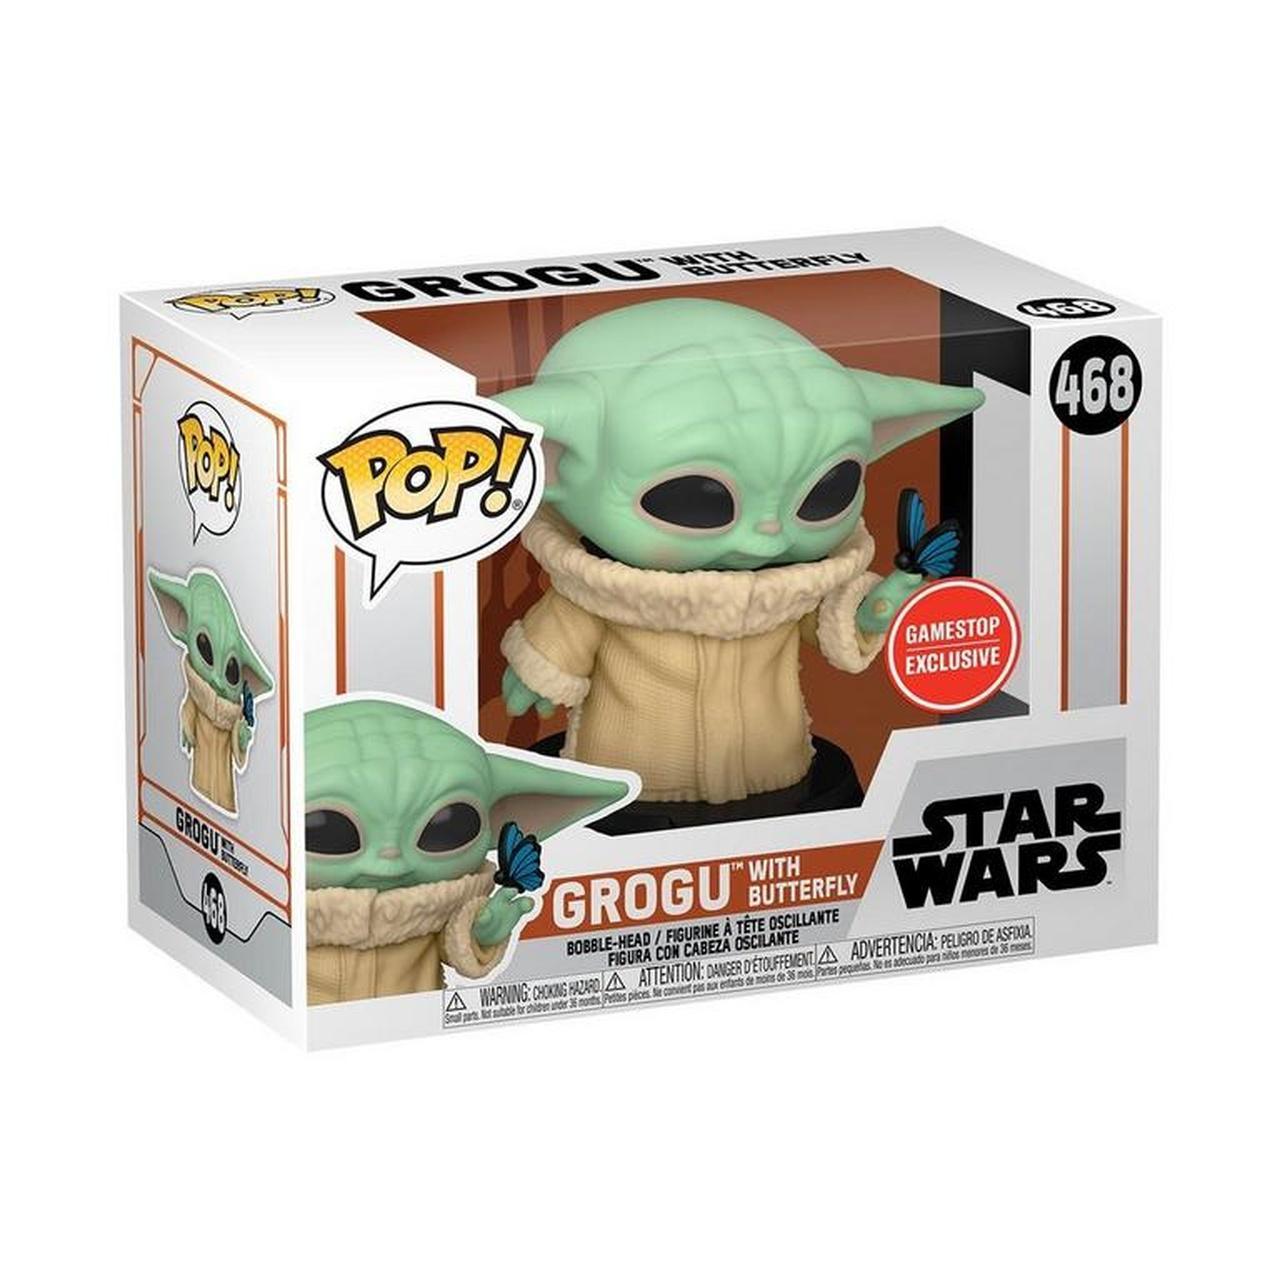 Funko Pop! Grogu Baby Yoda With Butterfly: Star Wars The Mandalorian Edição Especial Special Edition Exclusivo #468 - Funko